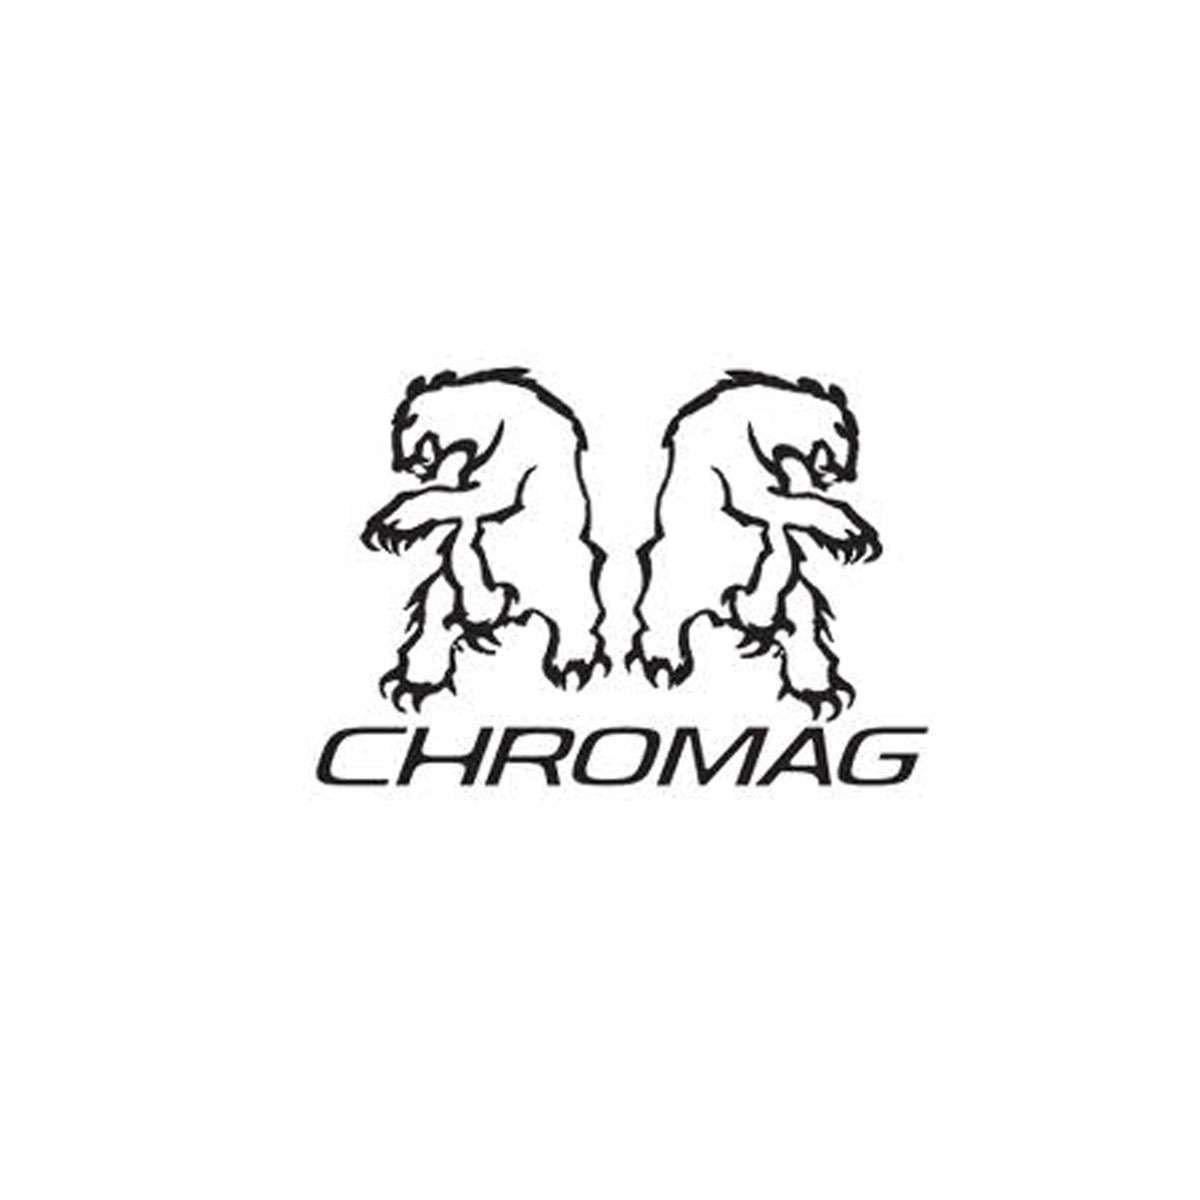 Chromag MTB-Lenker Fubars Cutlass Carbon Schwarz Cyan, 31.8 x 780 mm, 20 mm Rise